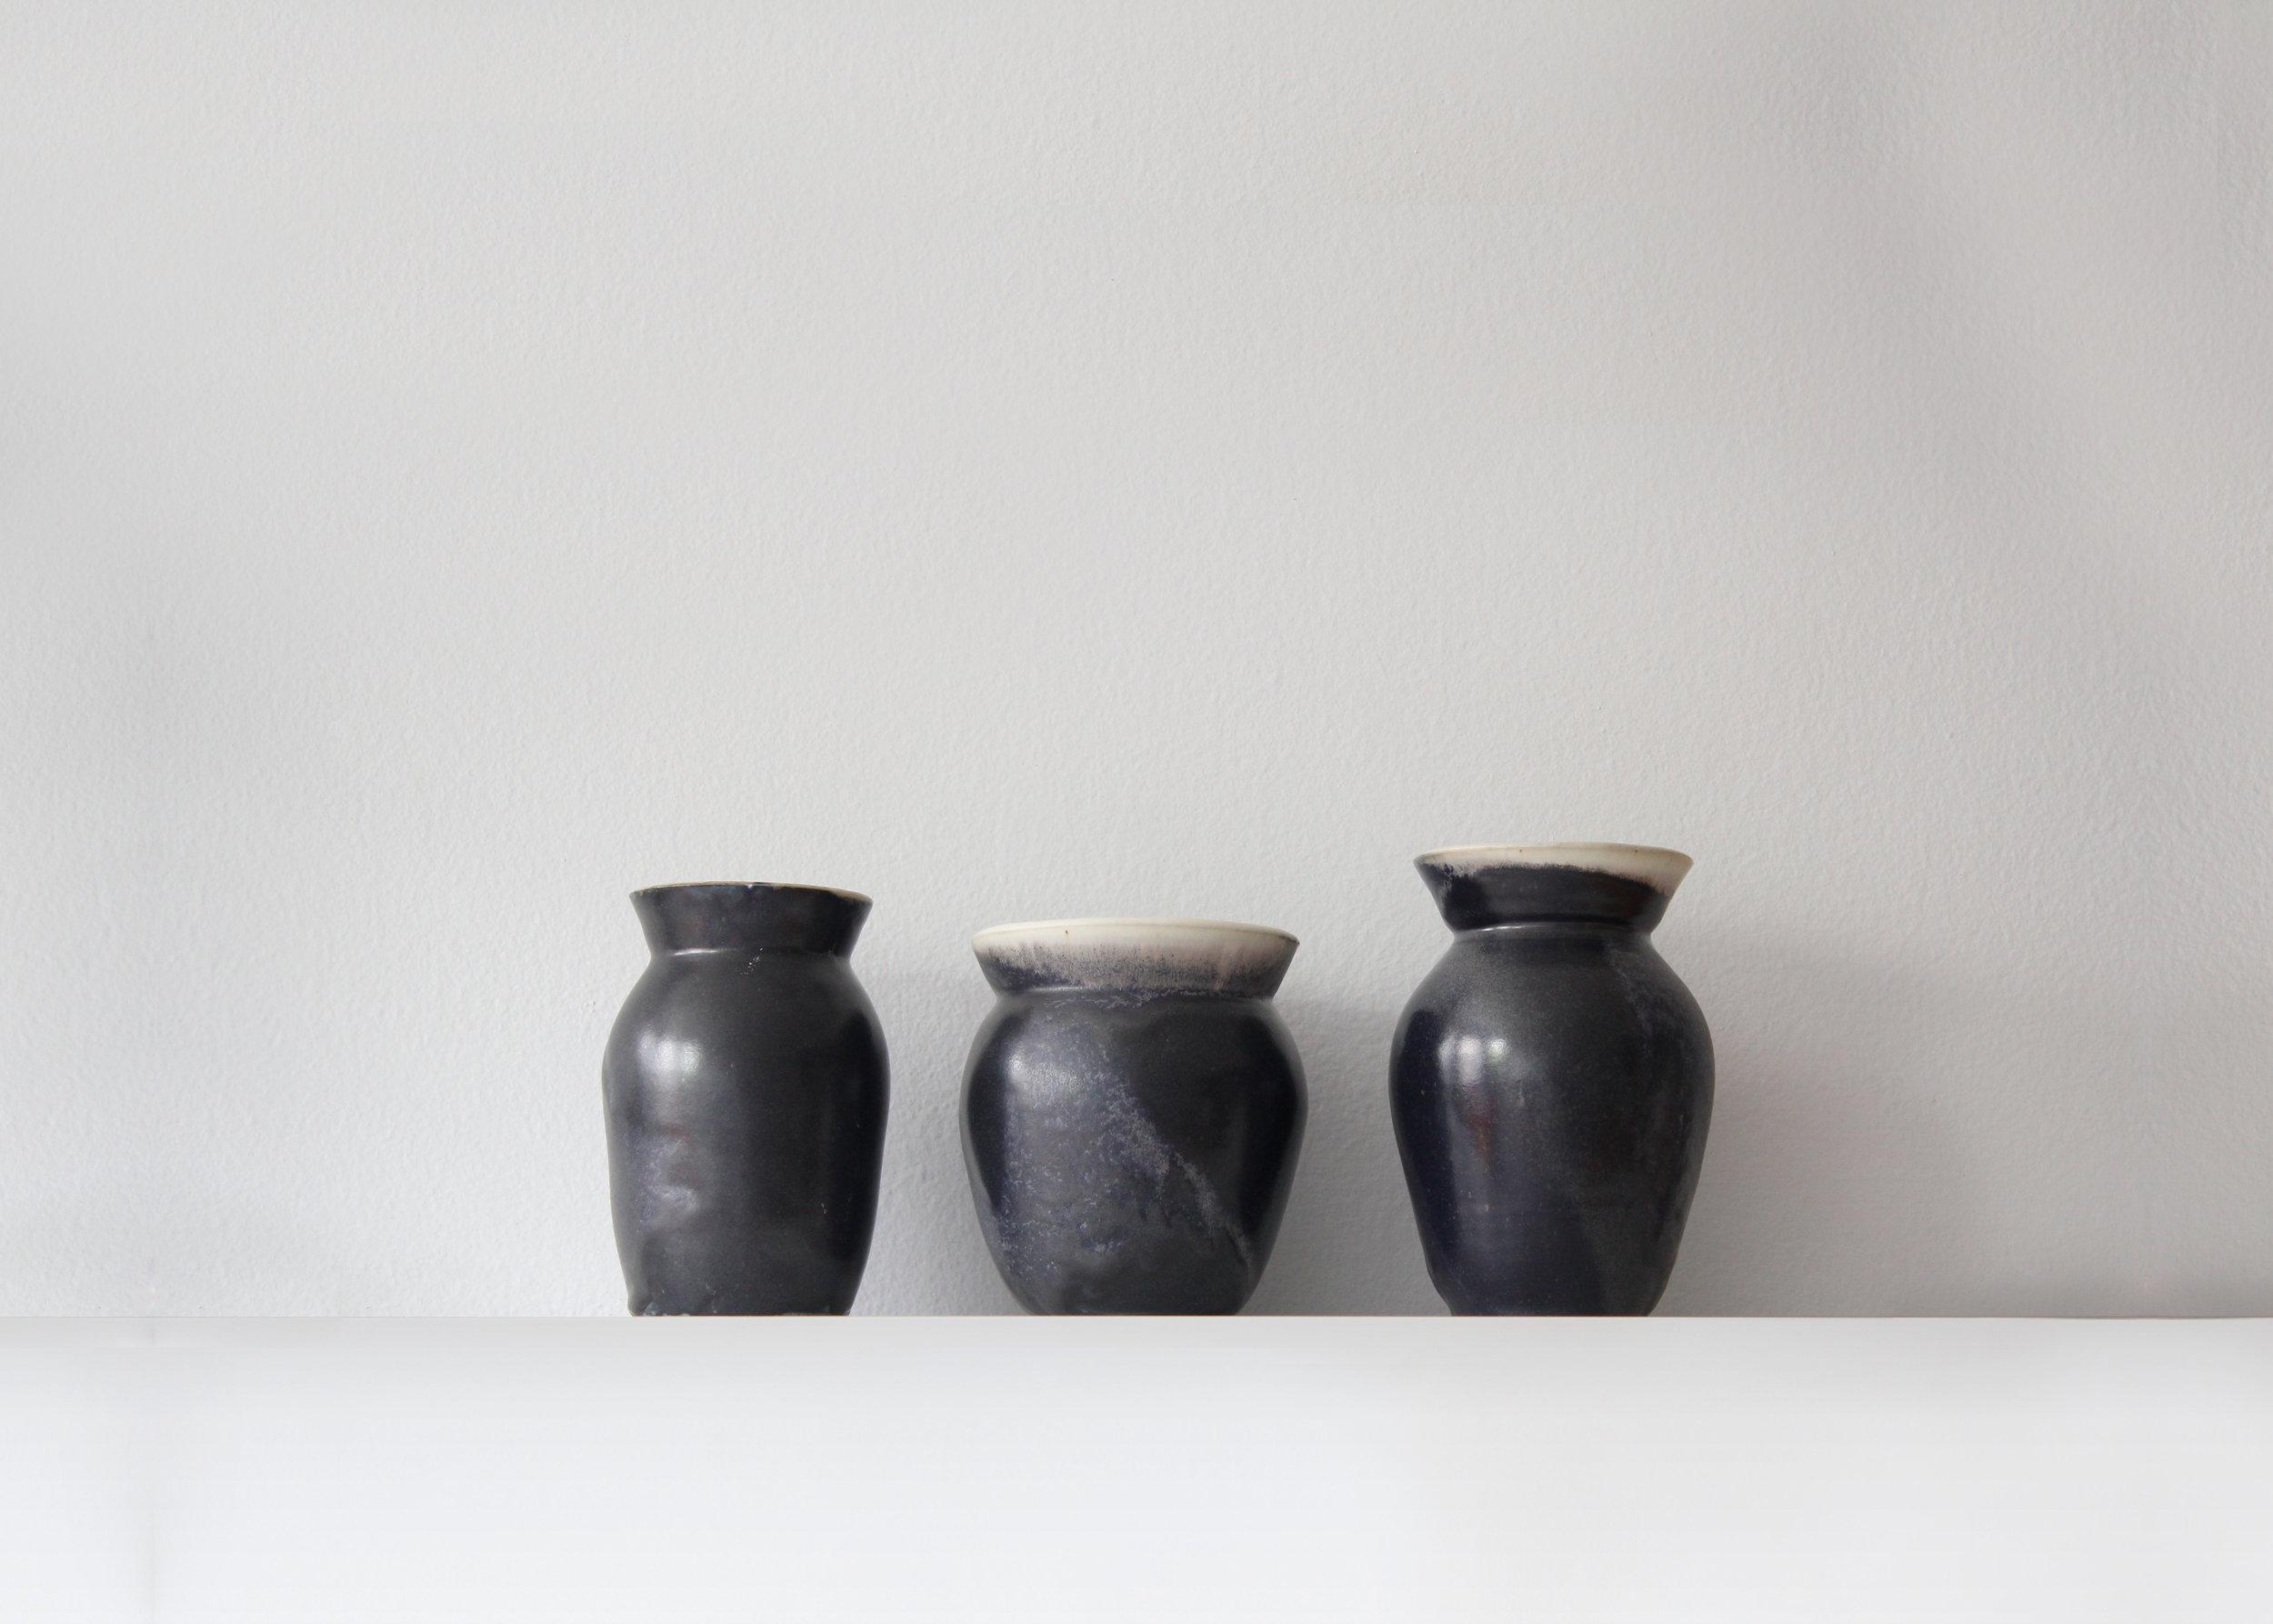 James-Rivas_Decay-Vase-Series_G.jpg